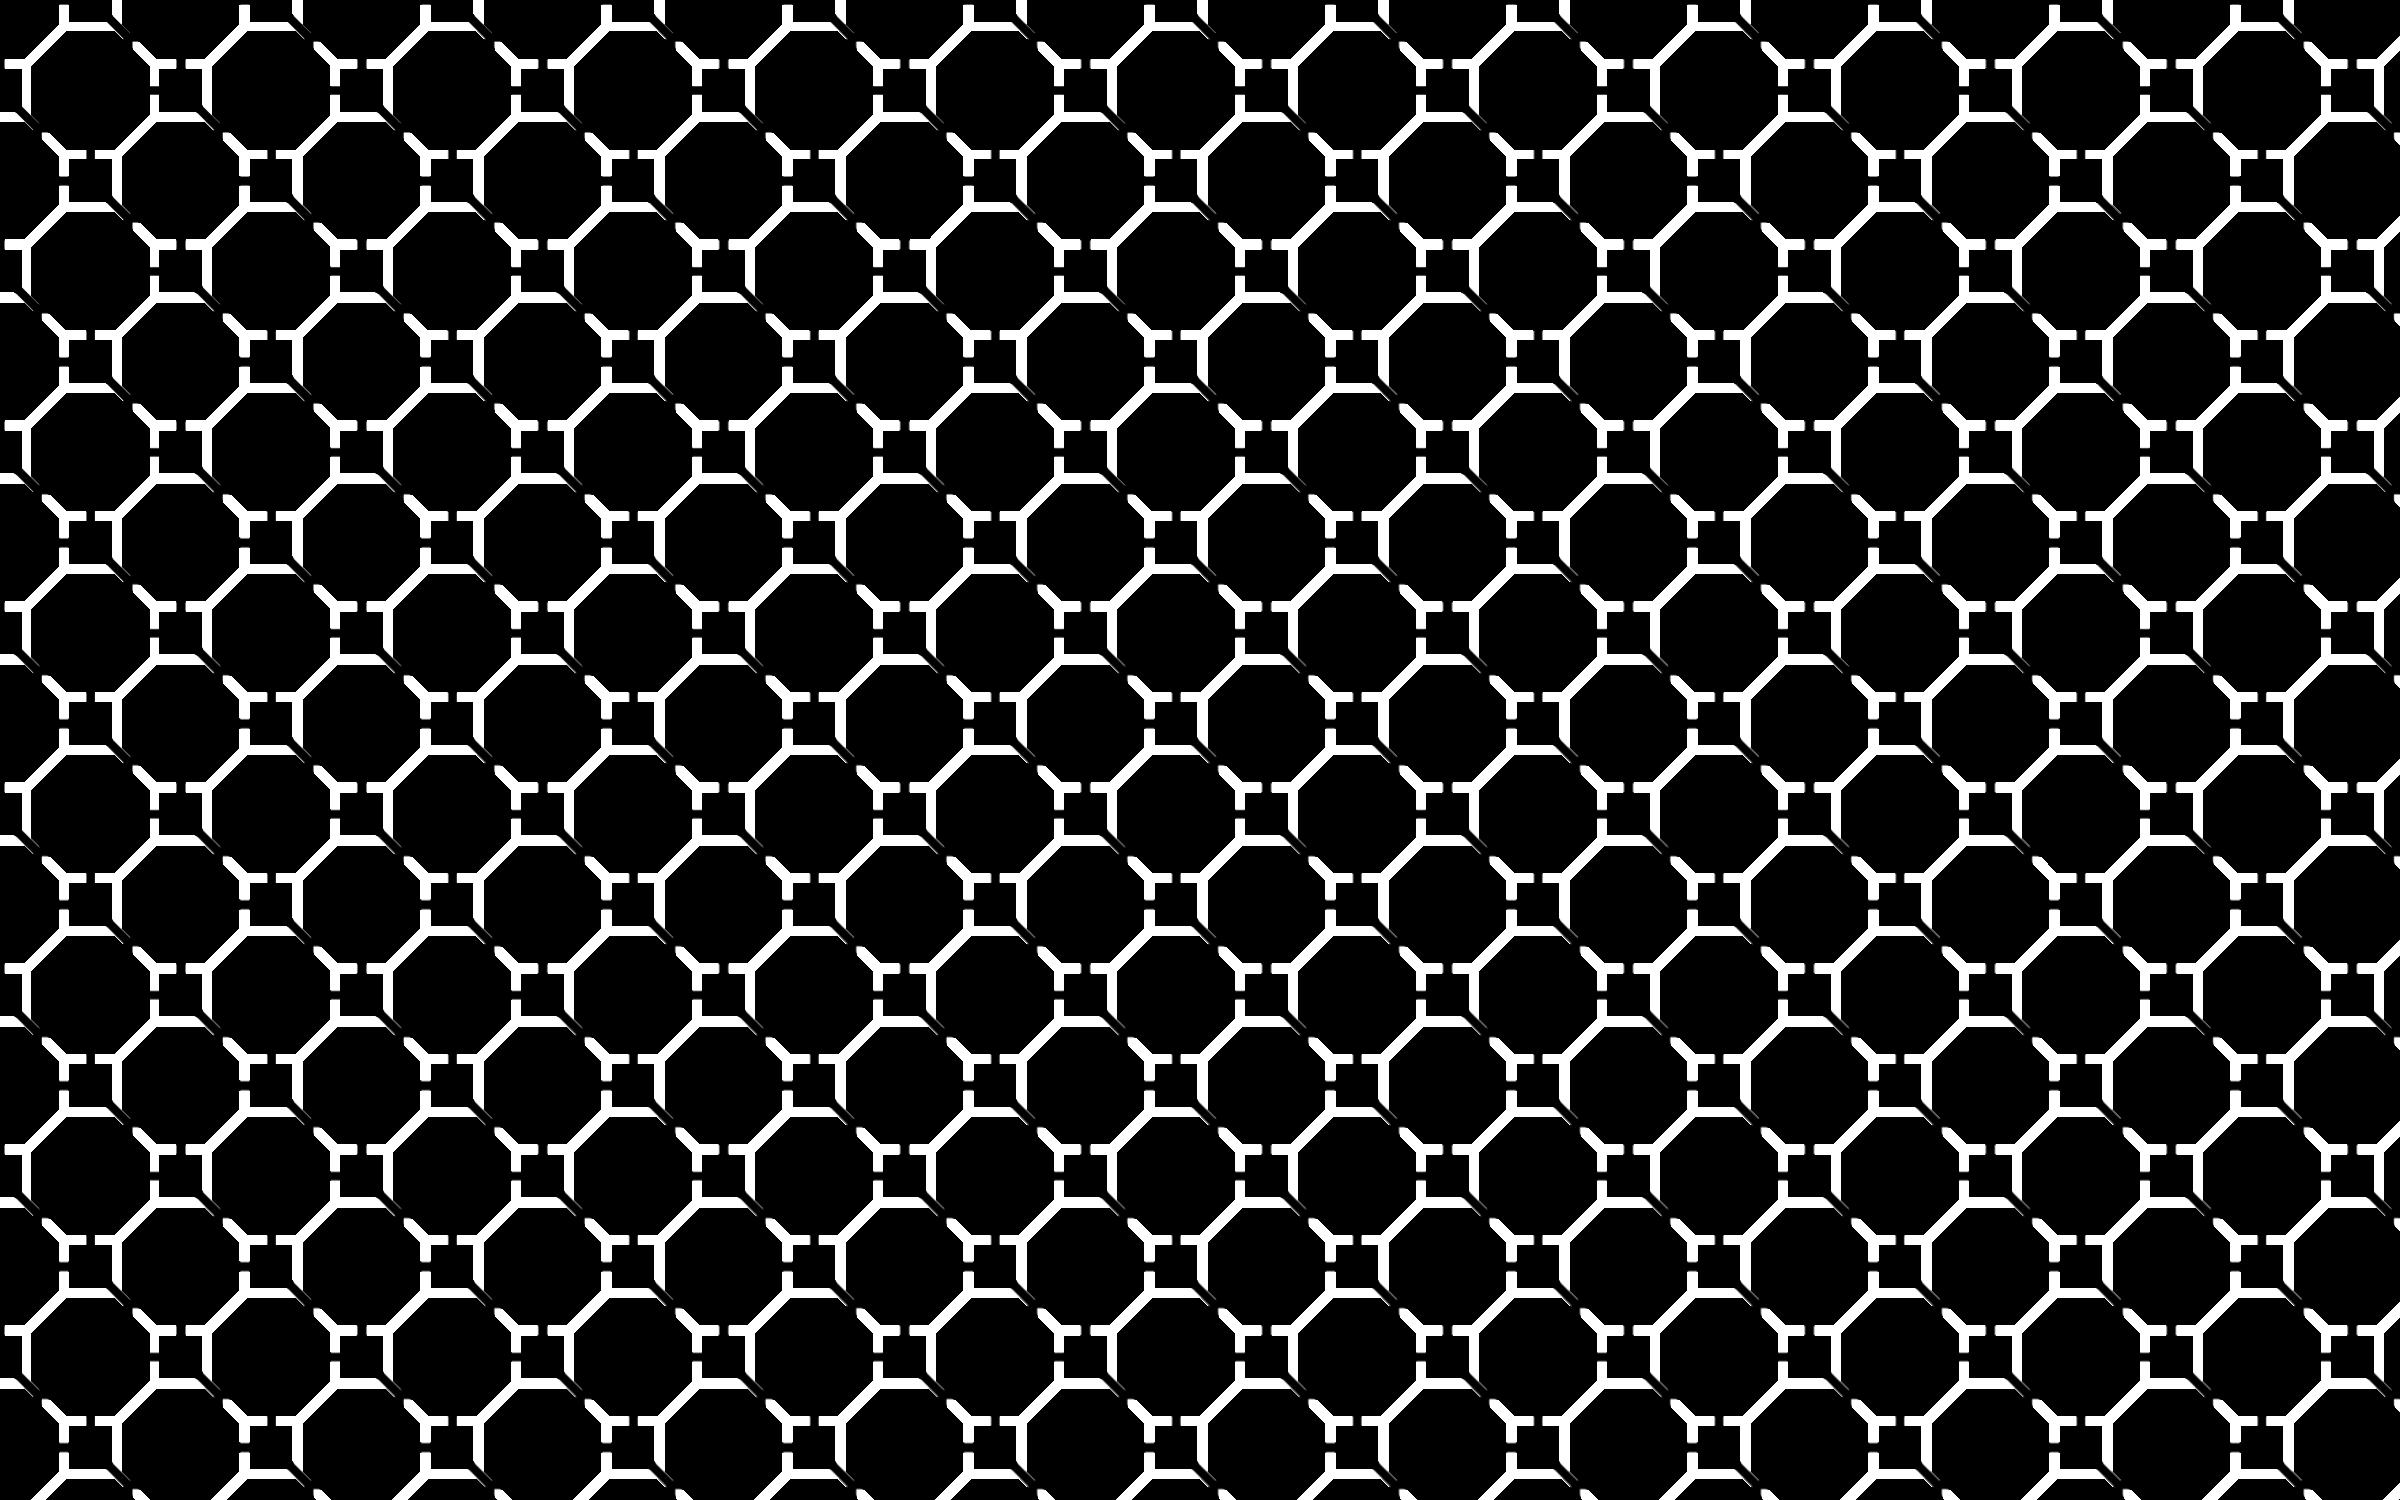 Line Pattern Design : Geometric line clipart suggest